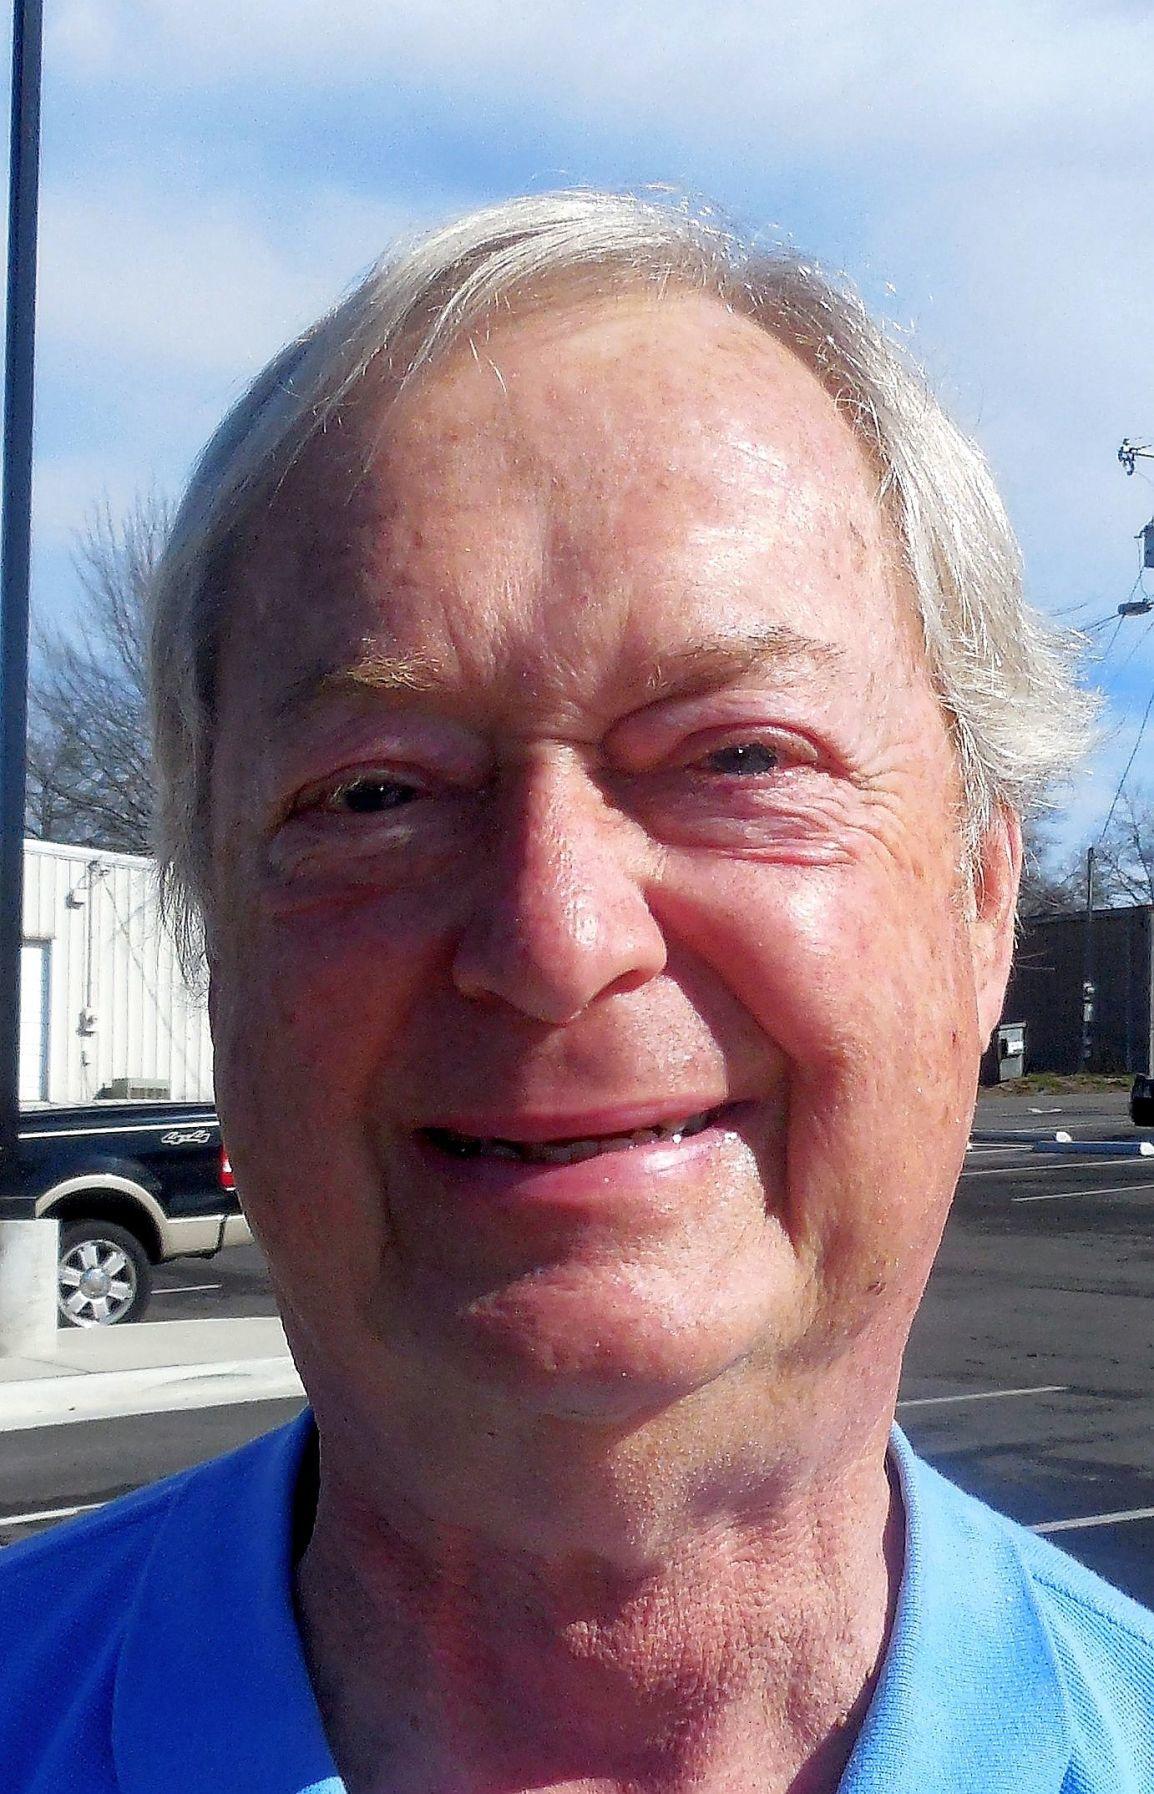 Judge David Breland